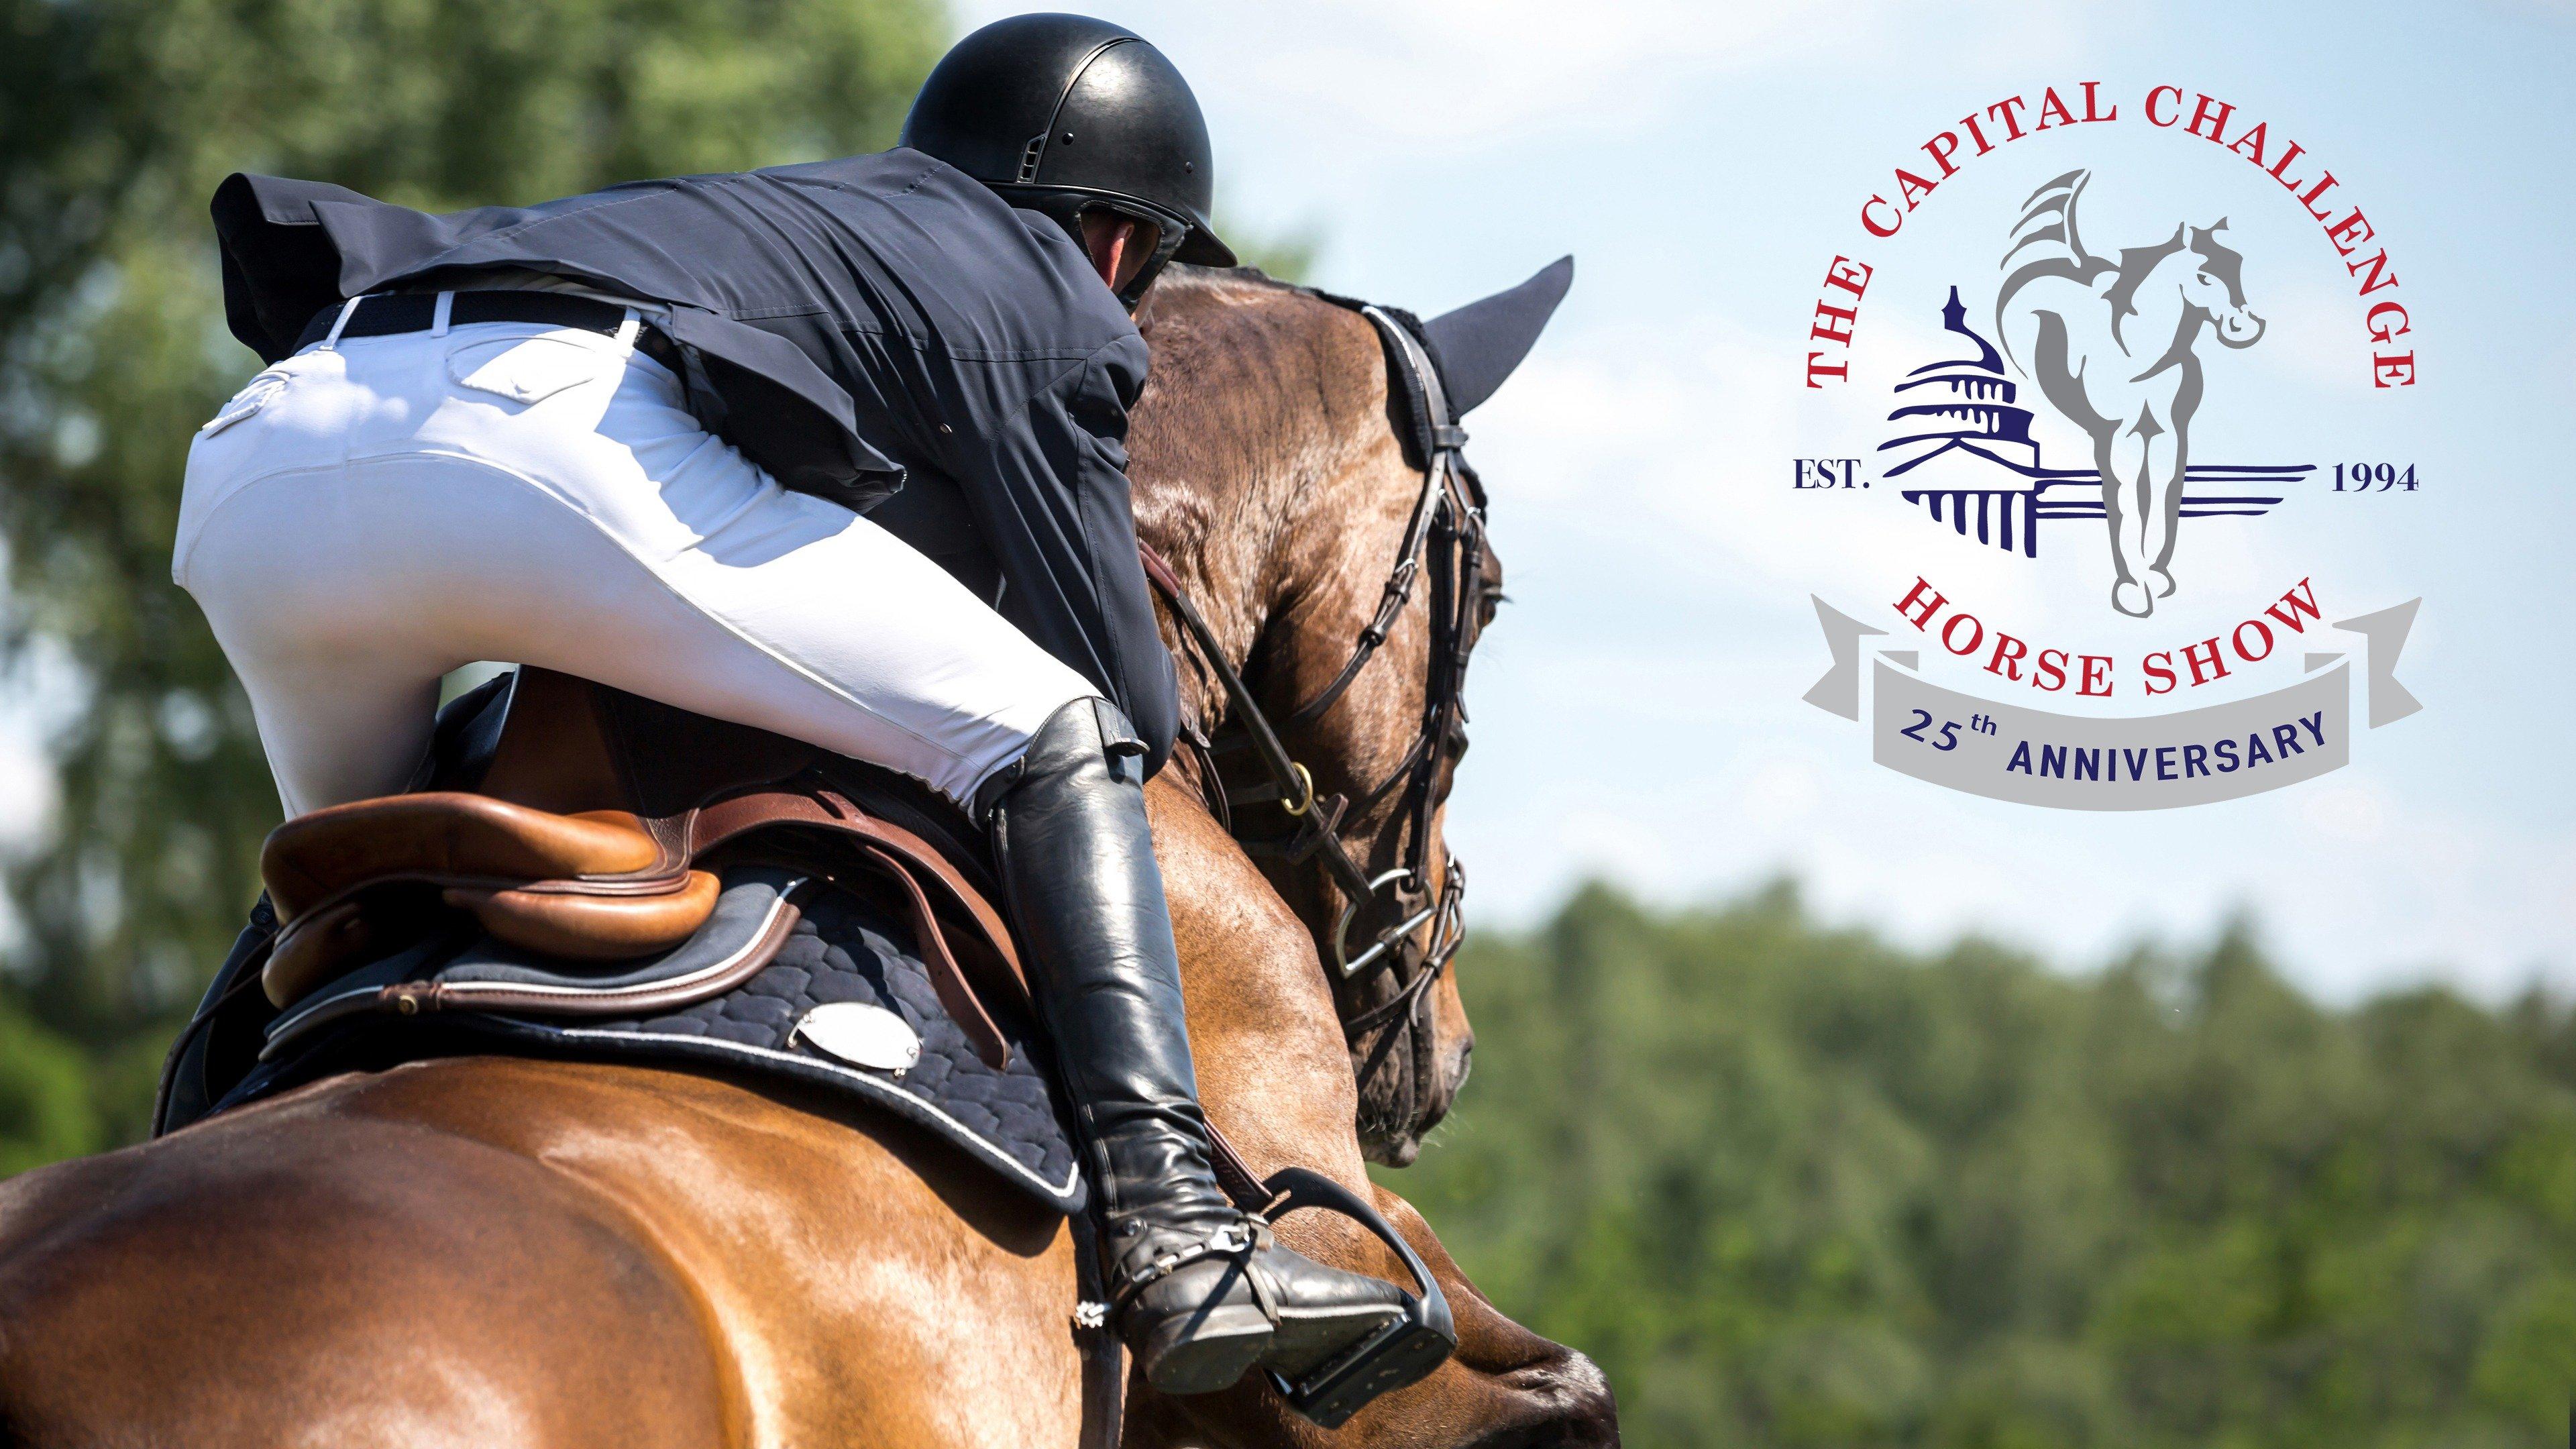 Capital Challenge Horse Show